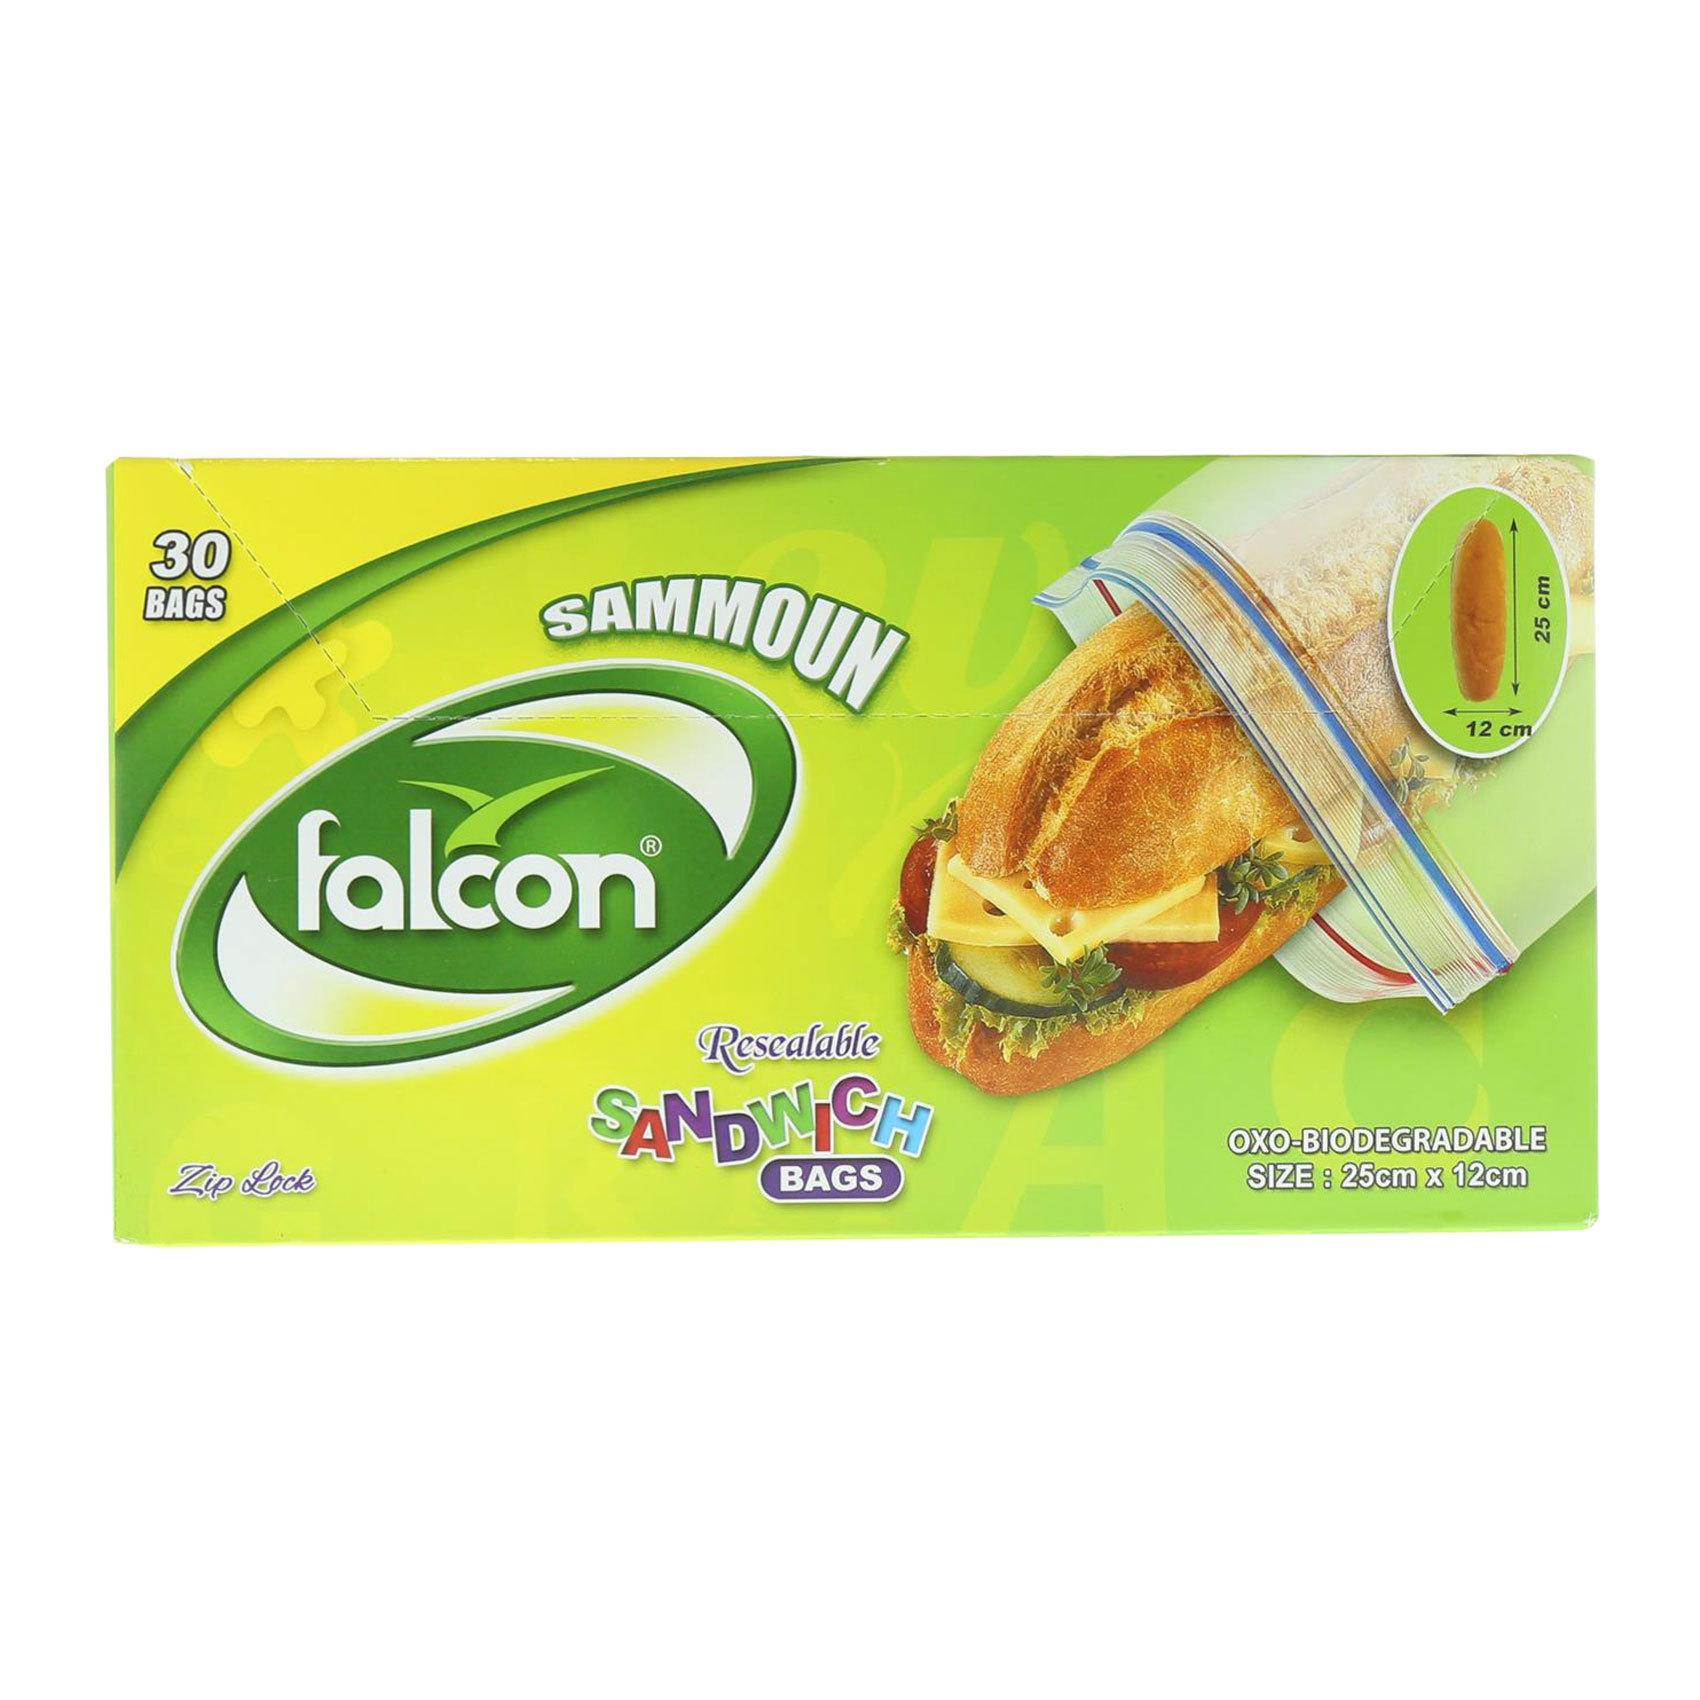 FALCON SAMOUN BAG M